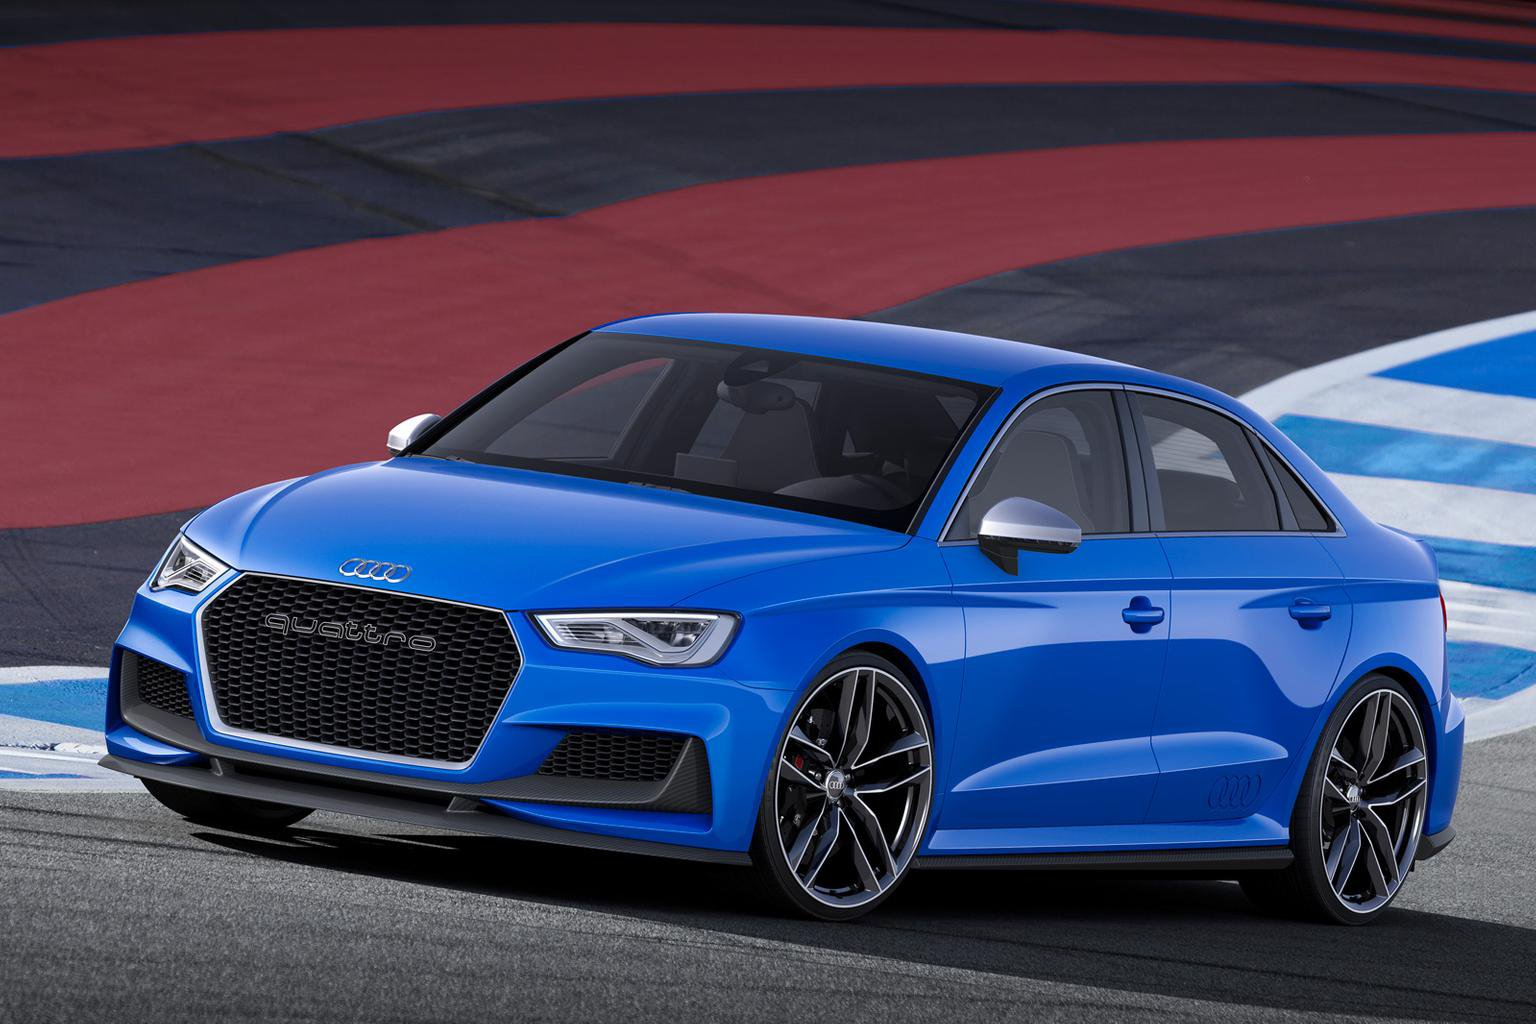 News round-up: 518bhp Audi A3 plus Mitsubishi Outlander PHEV finance deals